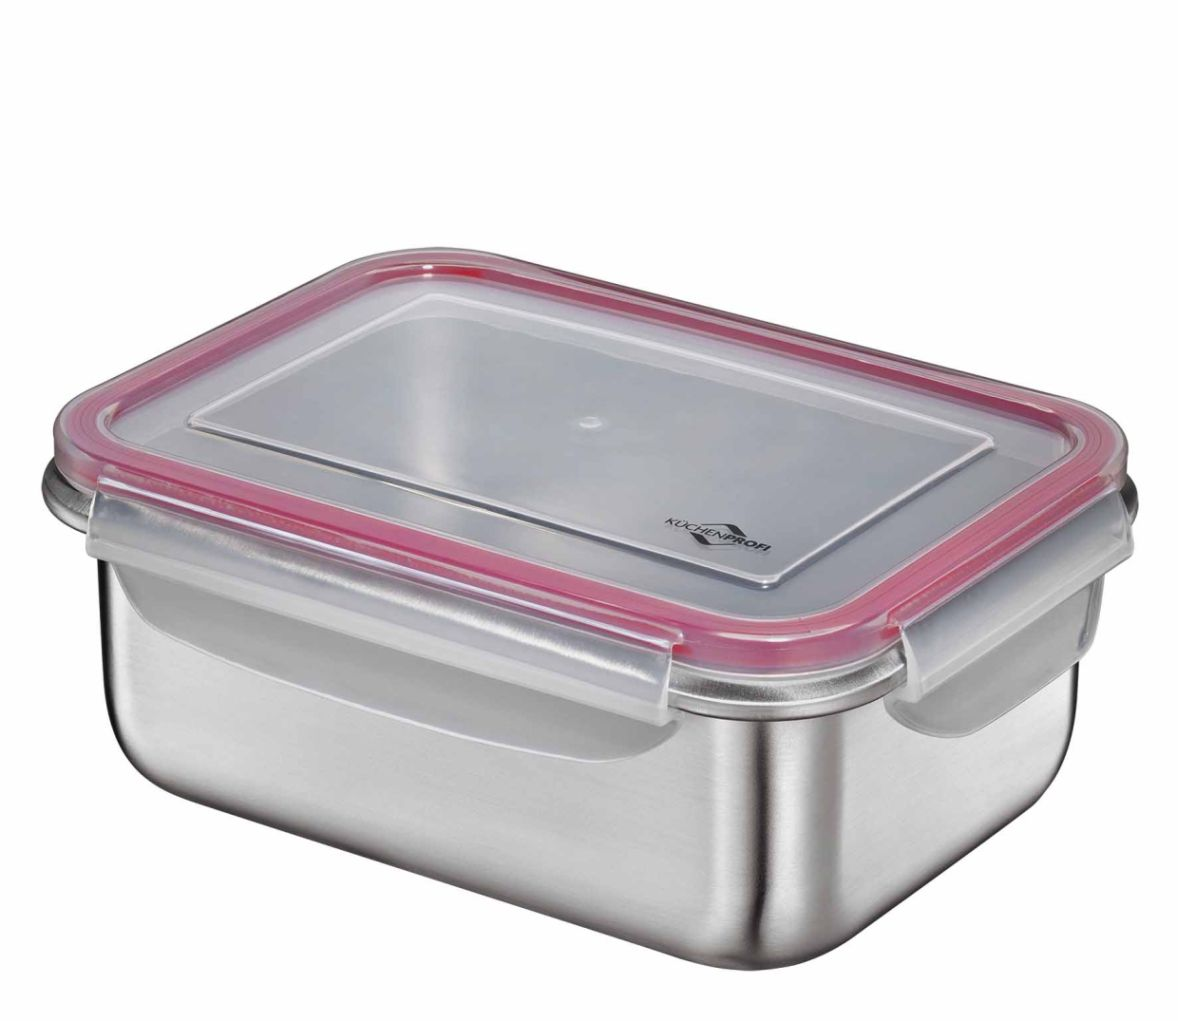 Svačinový box, 22x16x8,5 cm - Küchenprofi